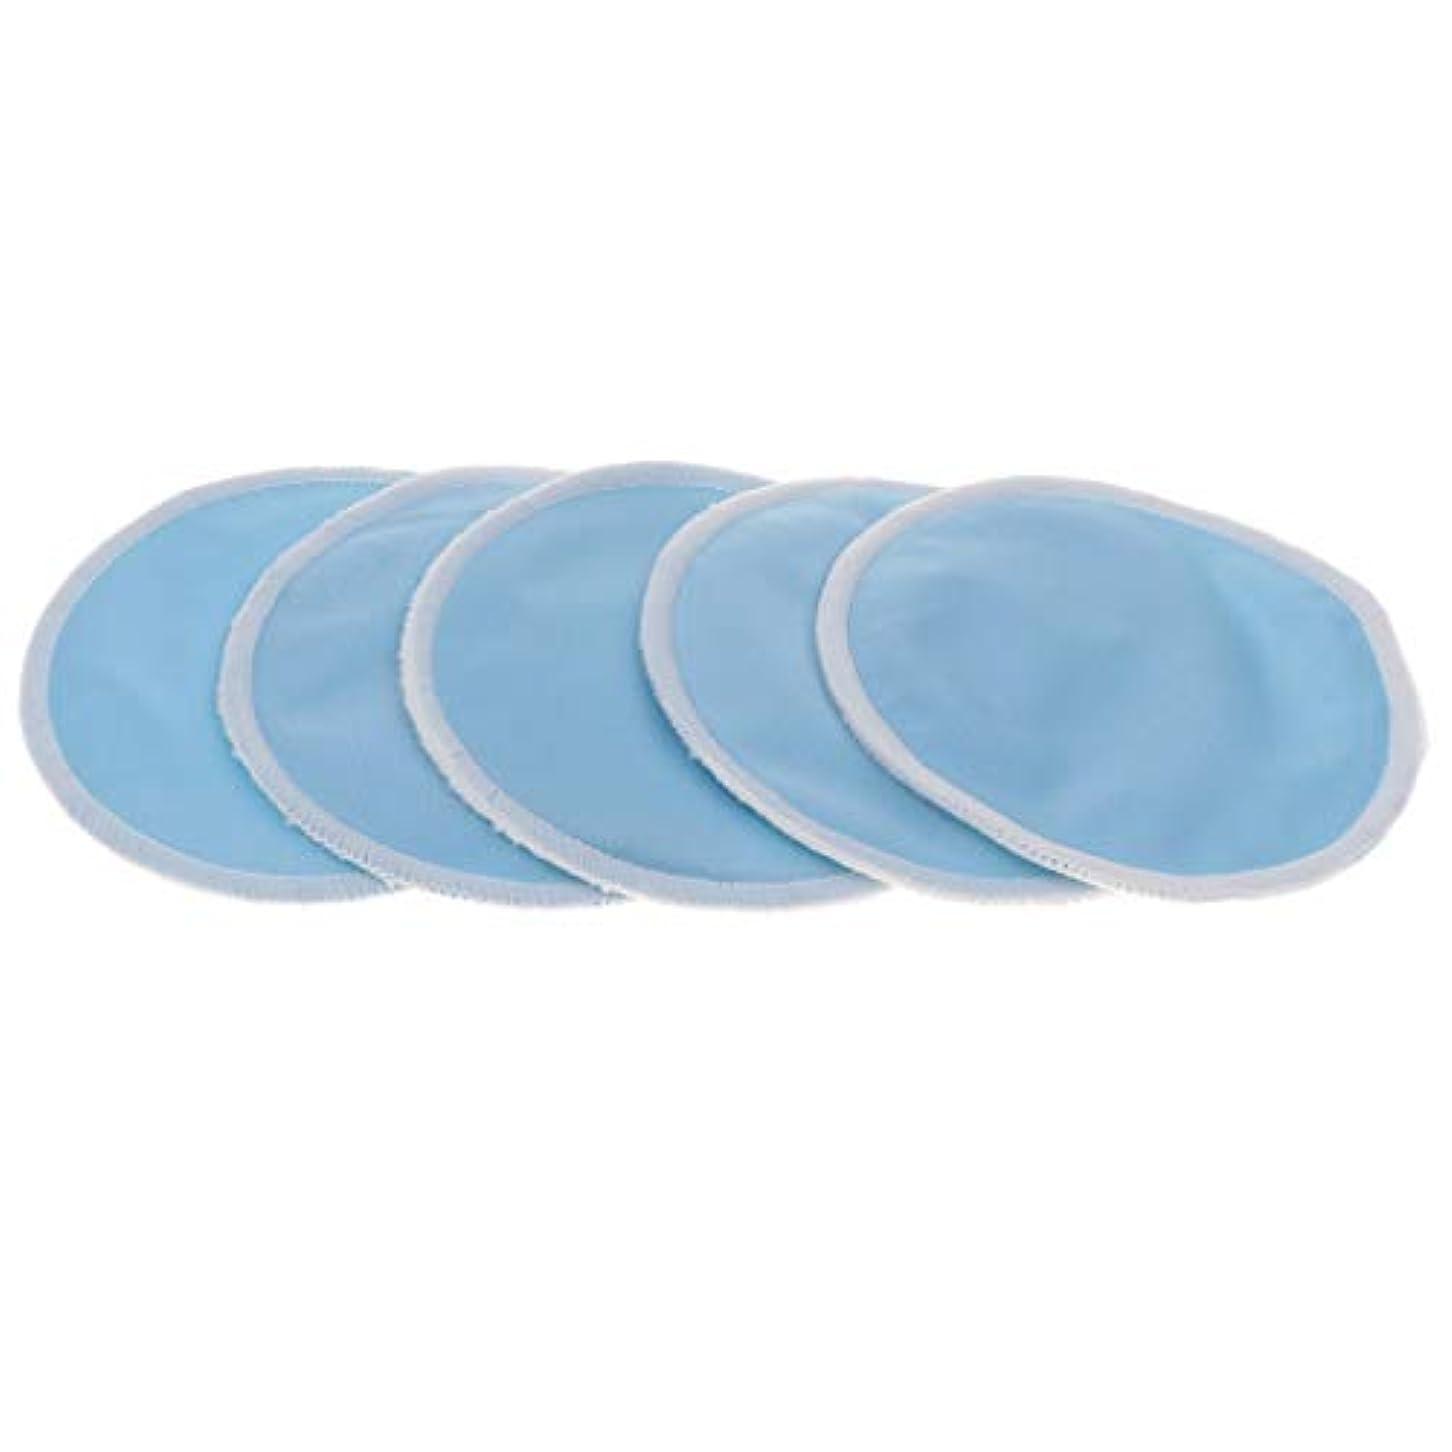 F Fityle 胸パッド クレンジングシート メイクアップ 竹繊維 円形 12cm 洗濯可能 再使用可 5個 全5色 - 青